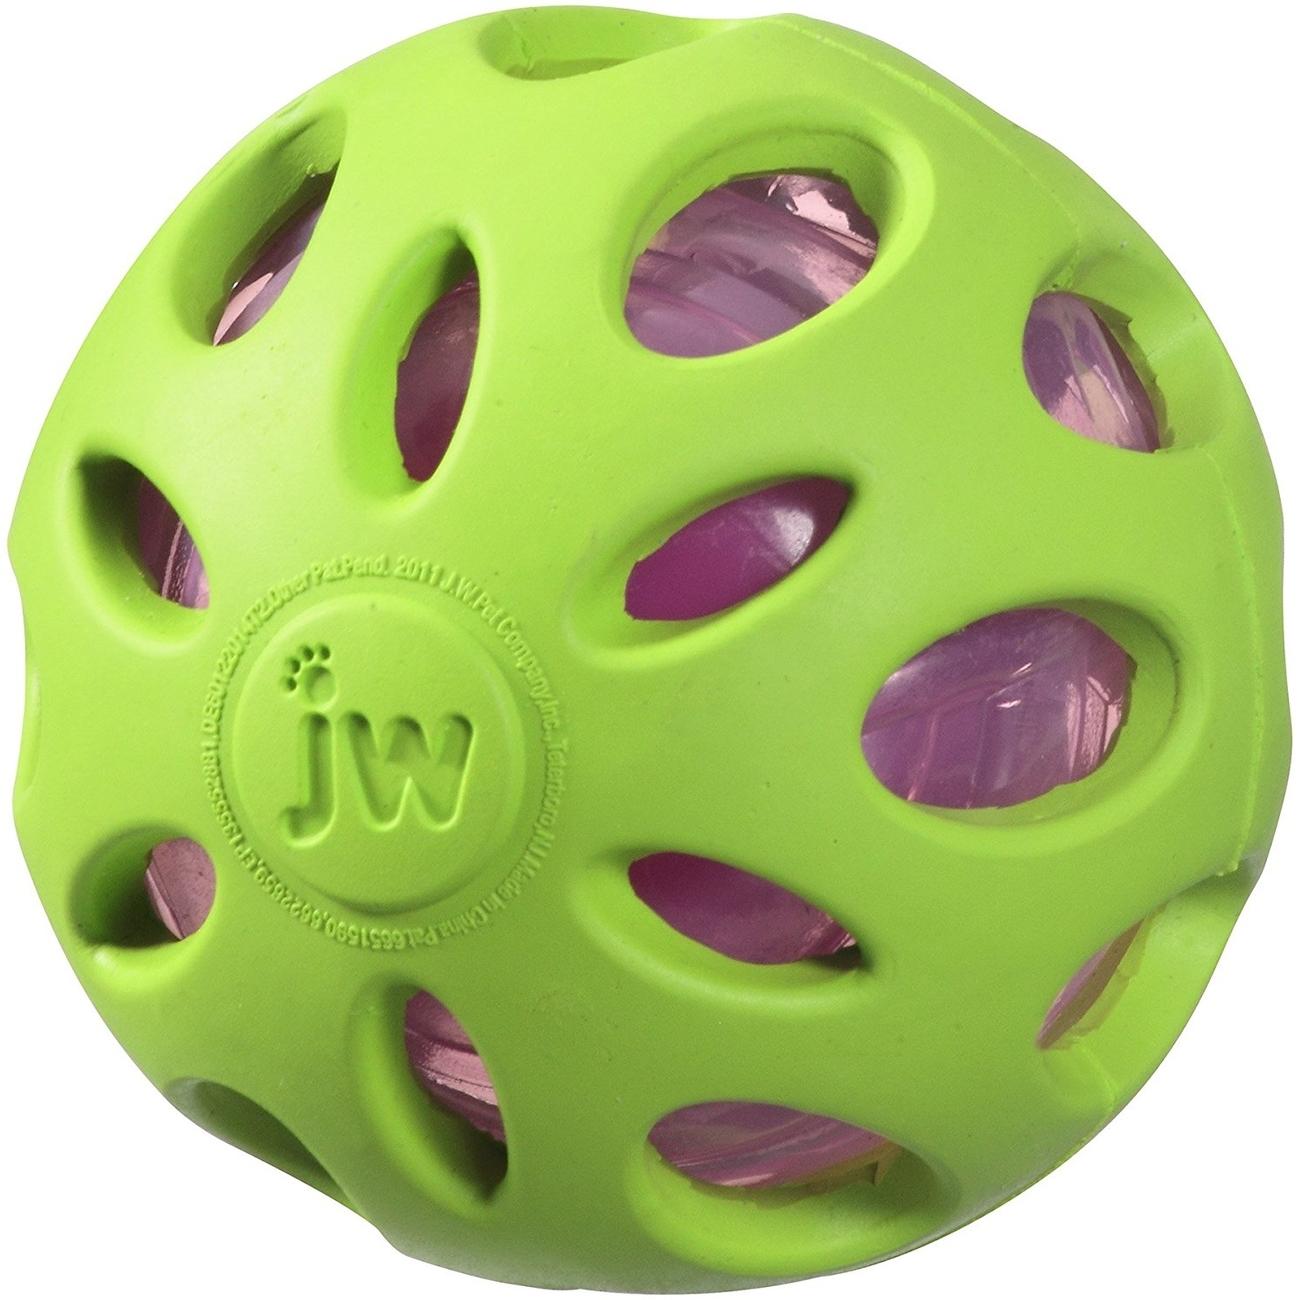 JW Pet Crackle Ball Hundespielzeug, Bild 4